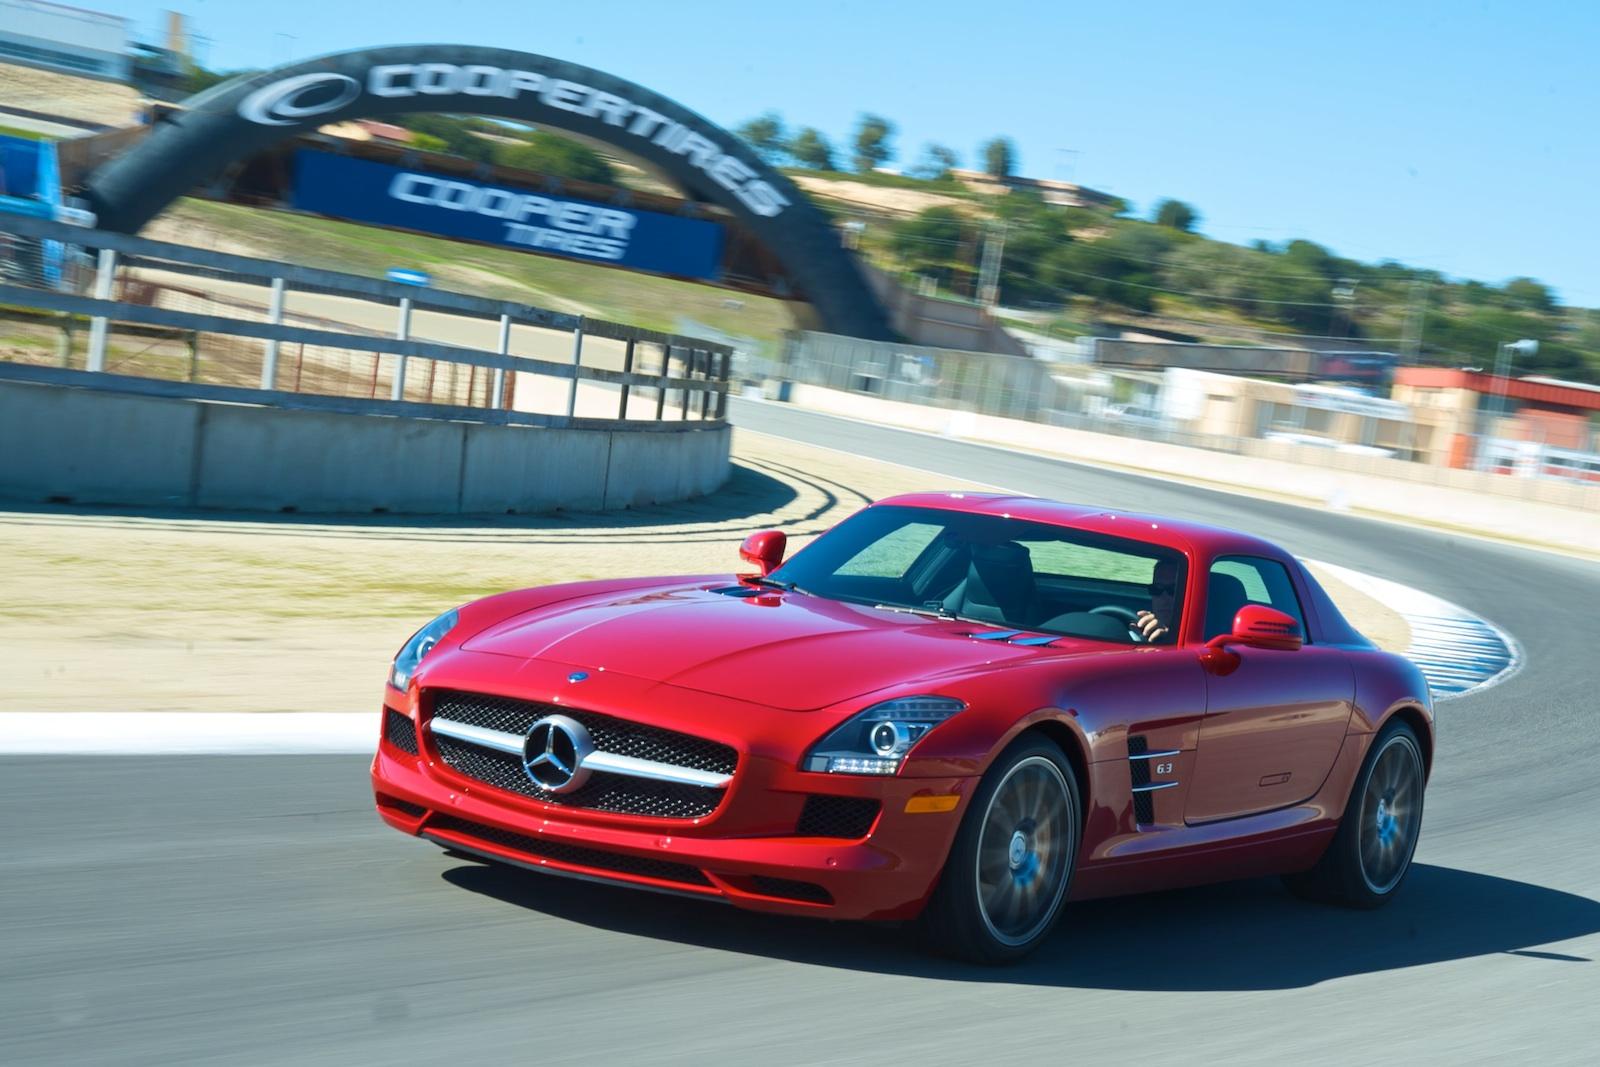 http://4.bp.blogspot.com/-KcKRUA7otT4/TrEjghaBt_I/AAAAAAAAFhI/WMOBL70zgqc/s1600/Mercedes+SLS+AMG+1.jpg